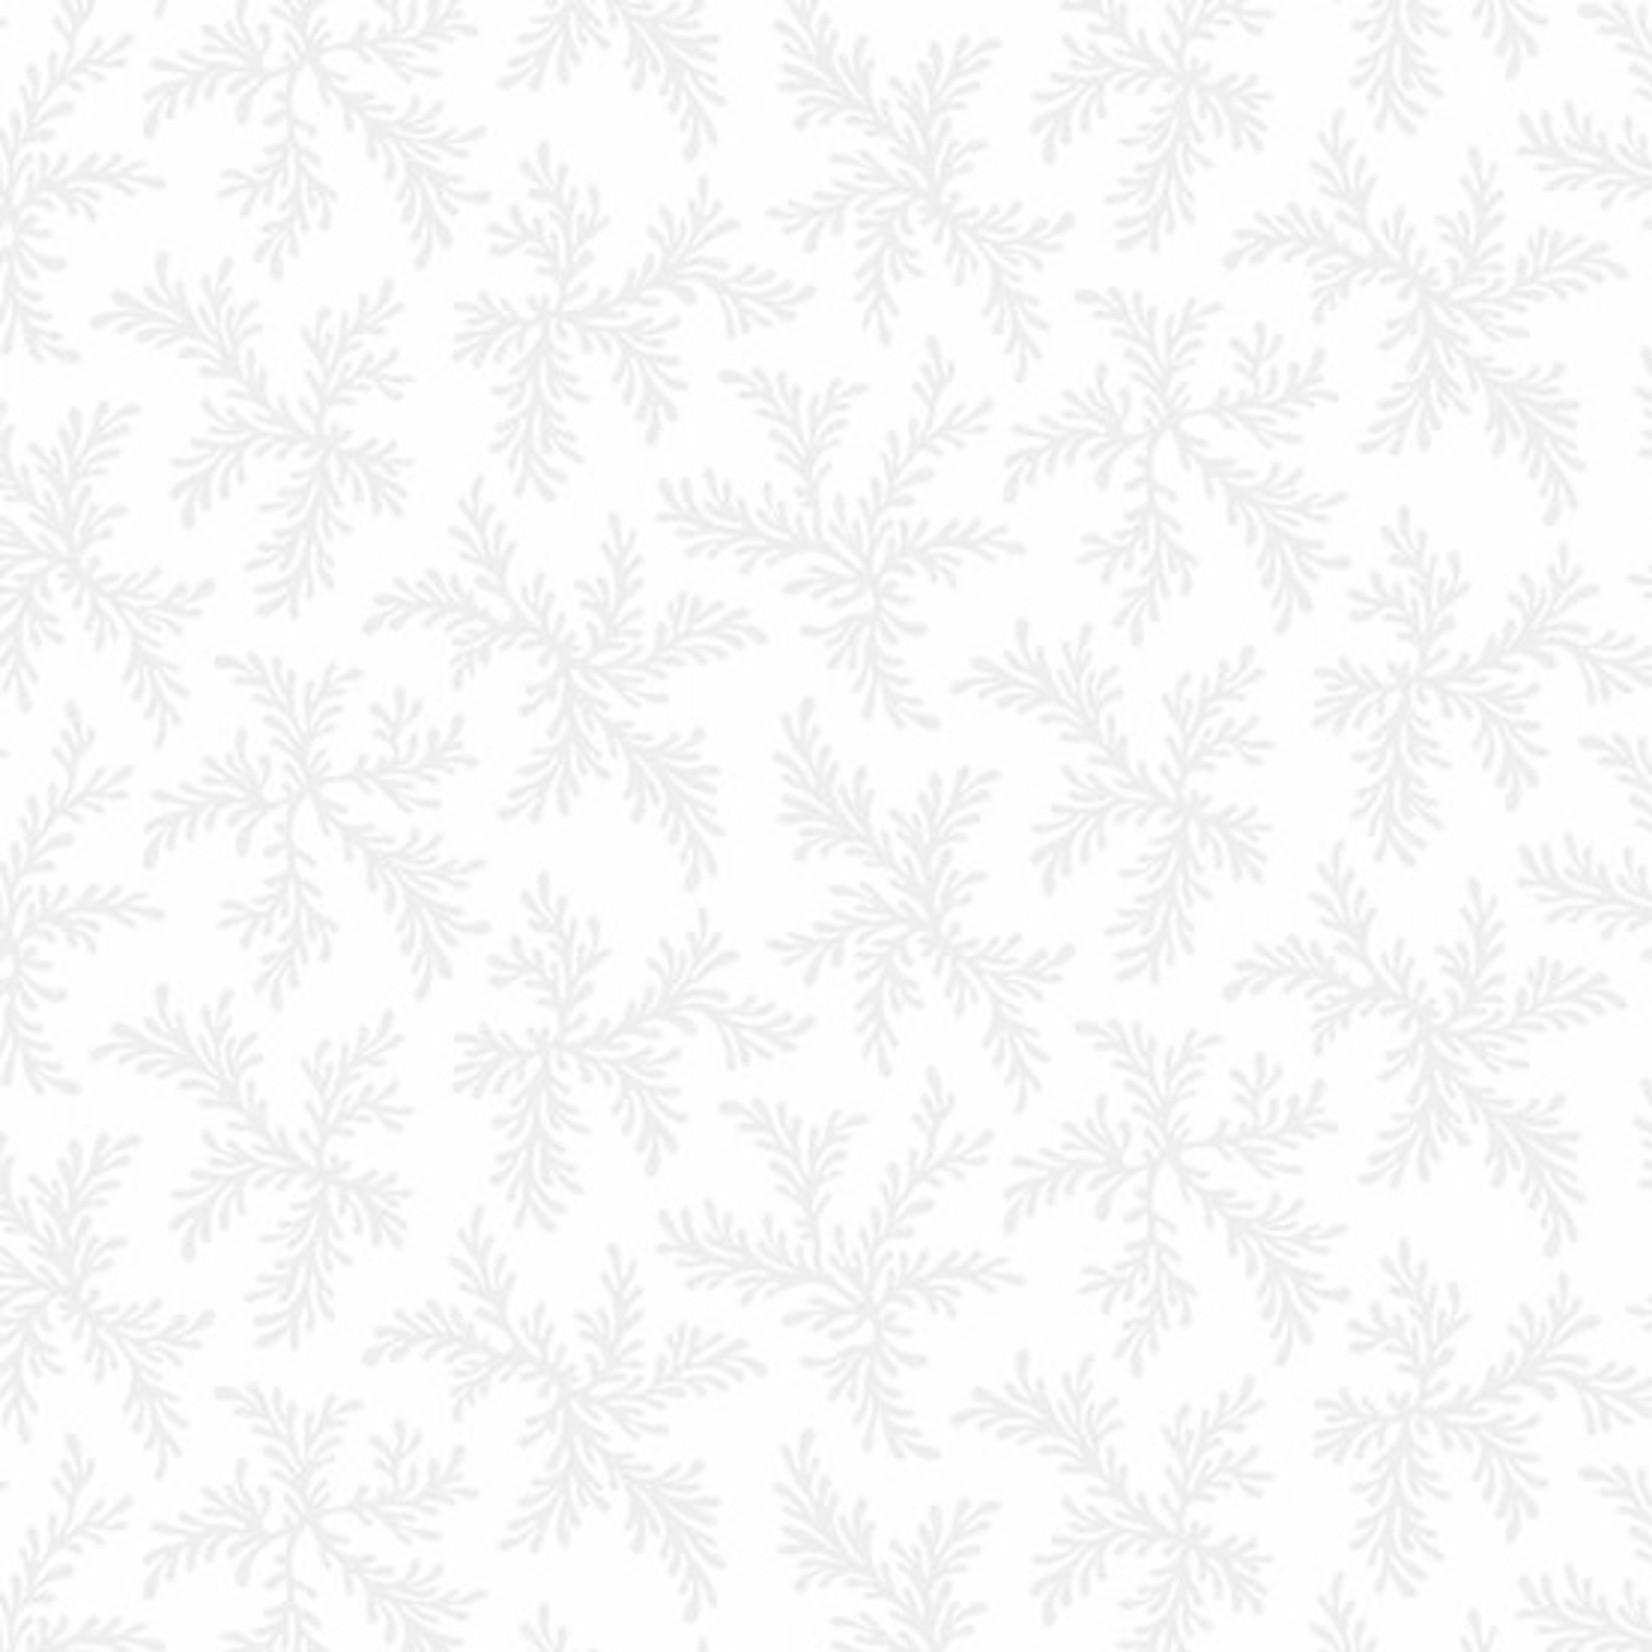 ANDOVER Century Whites, Coral Fern CS-9687-WW $0.18 per cm or $18/m